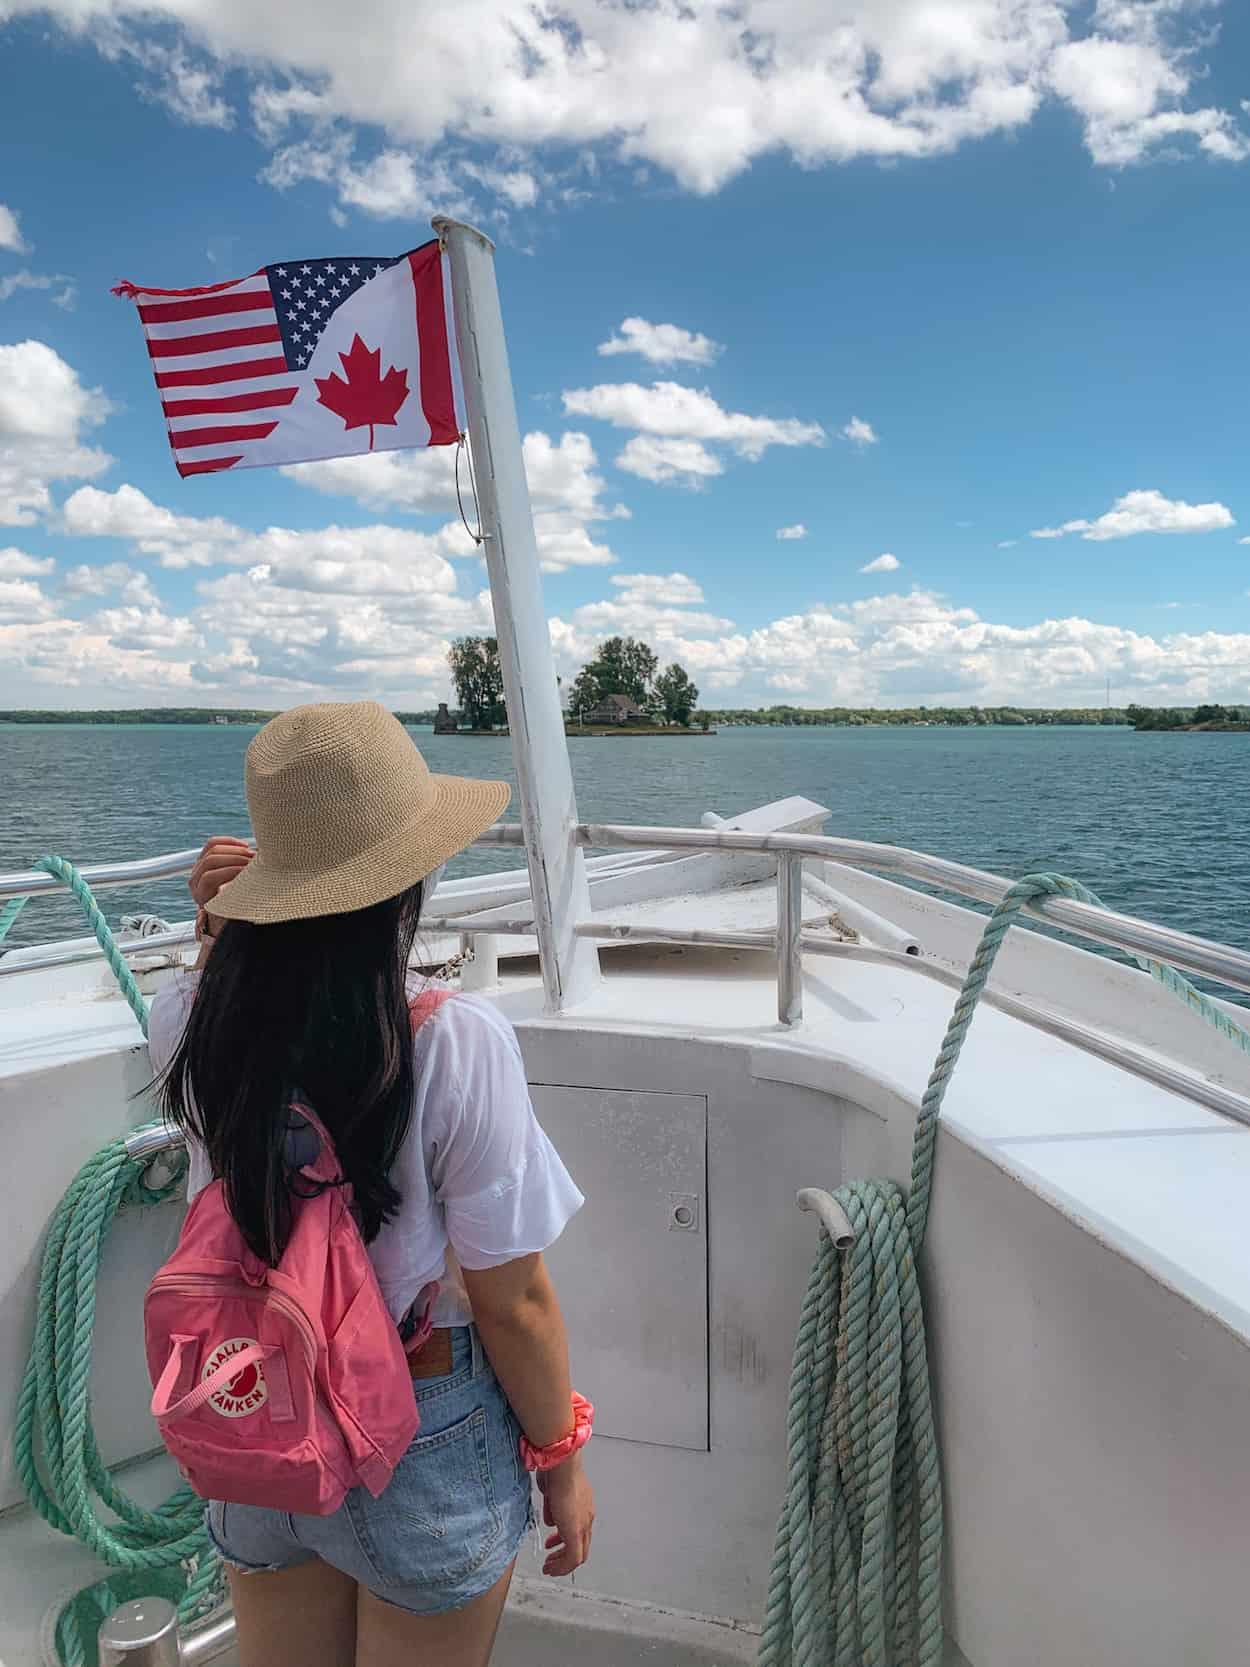 Gananoque Boat Line at the 1000 Islands, Ontario